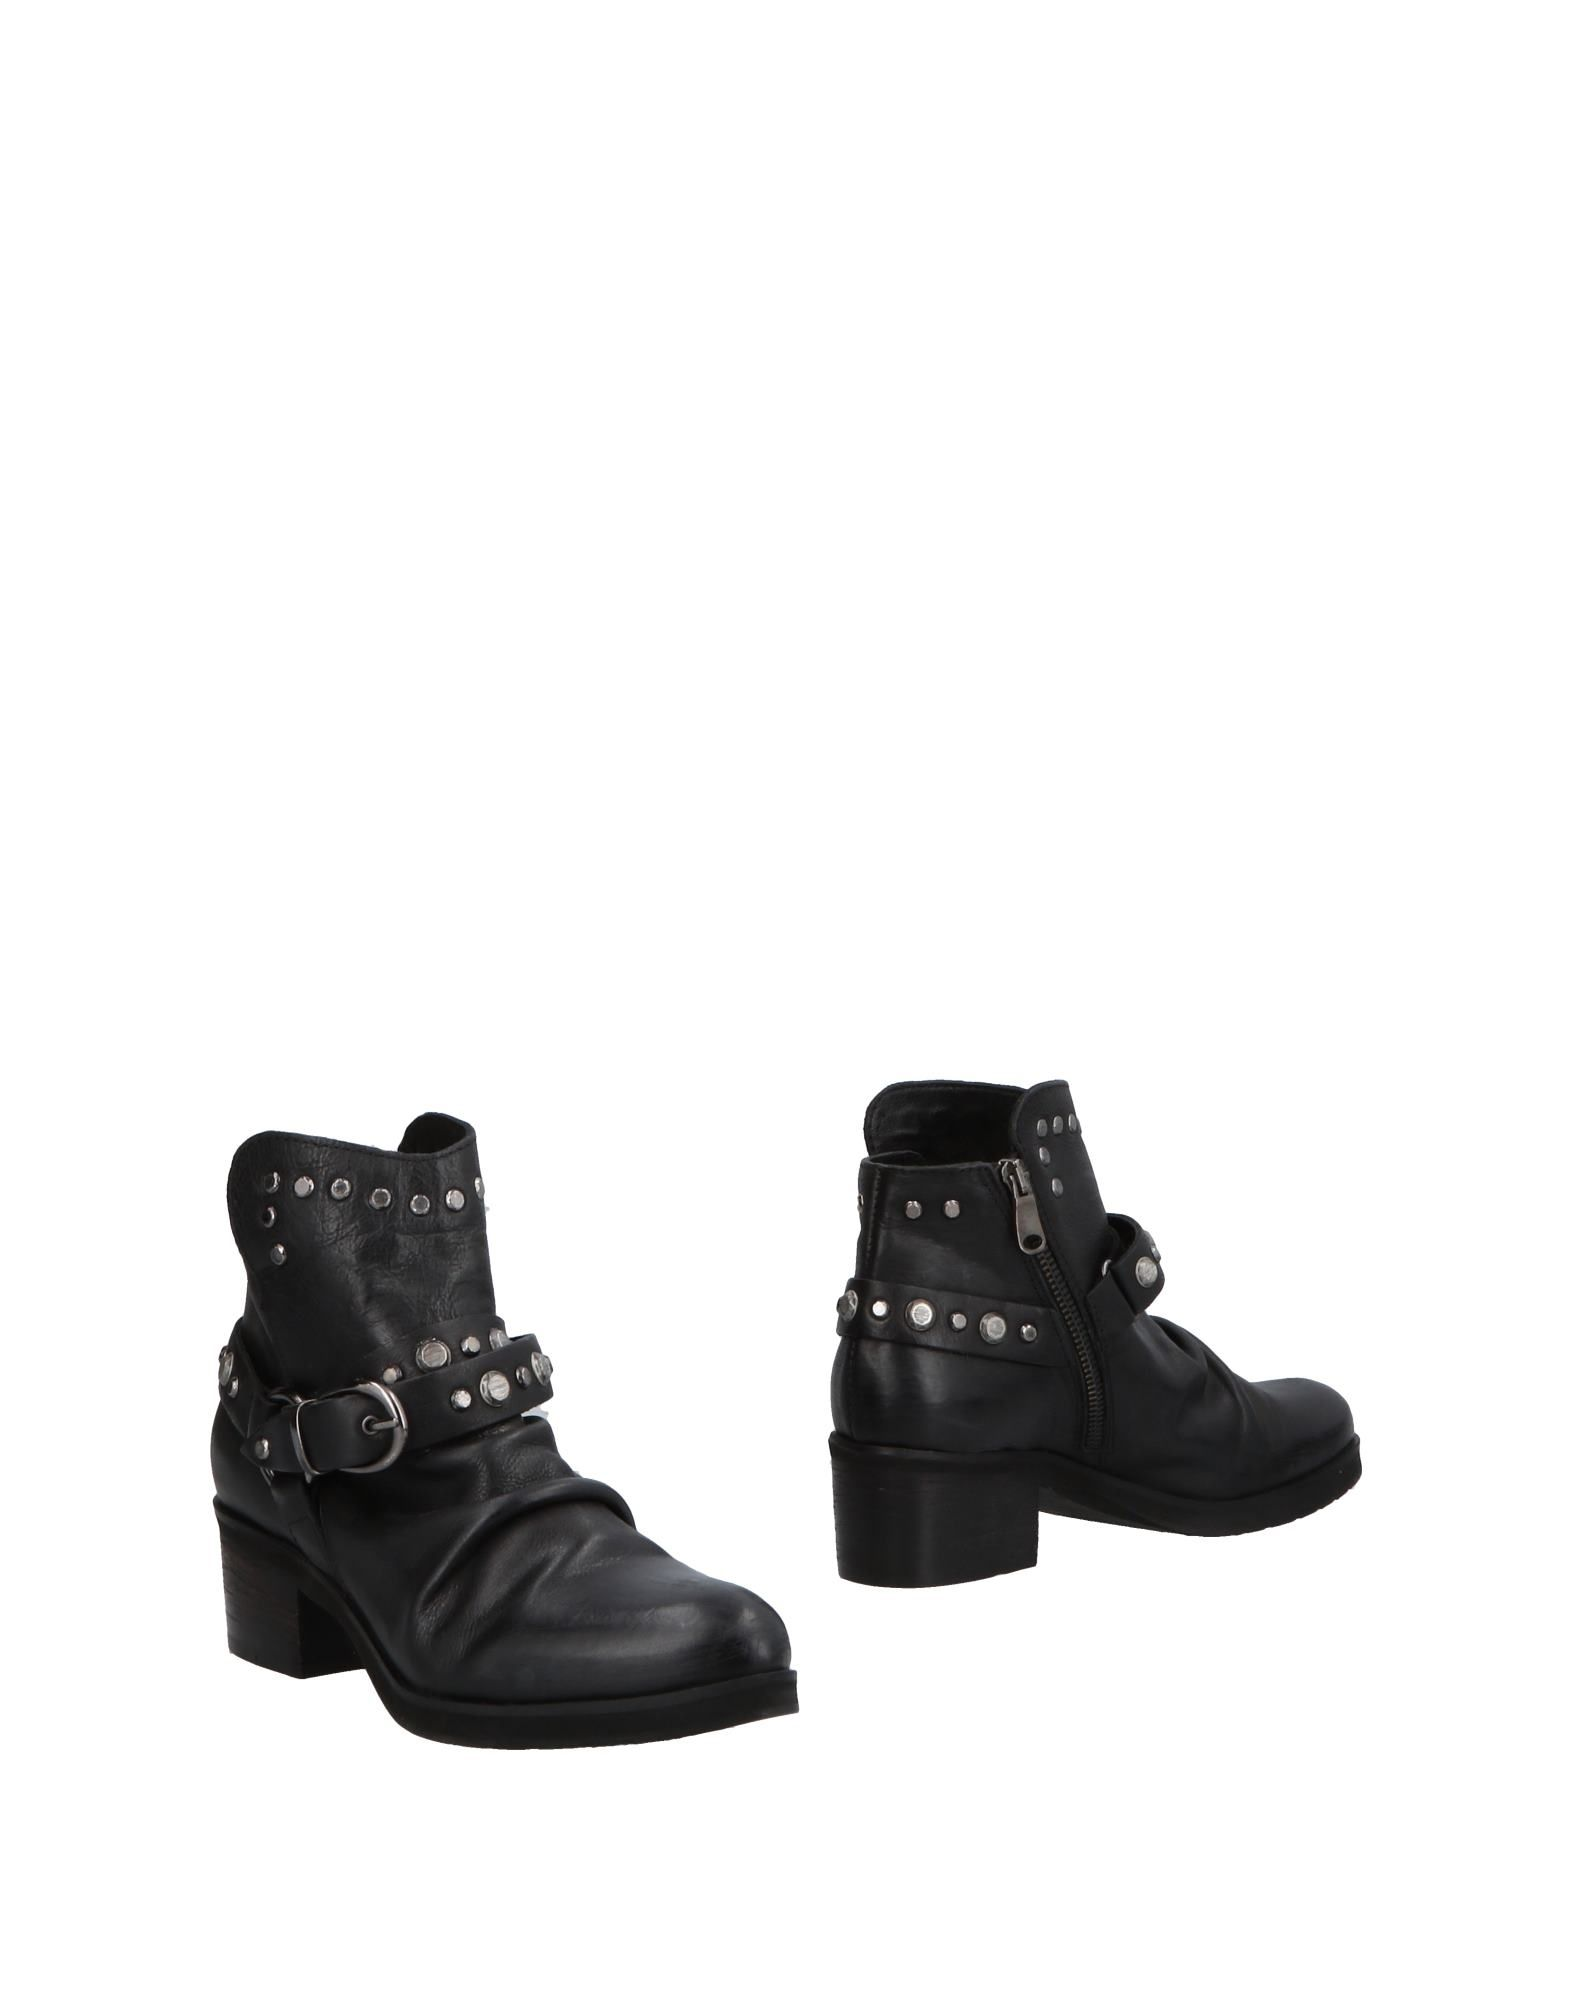 J|D Julie Dee Stiefelette Damen  11508498NI Gute Qualität beliebte Schuhe